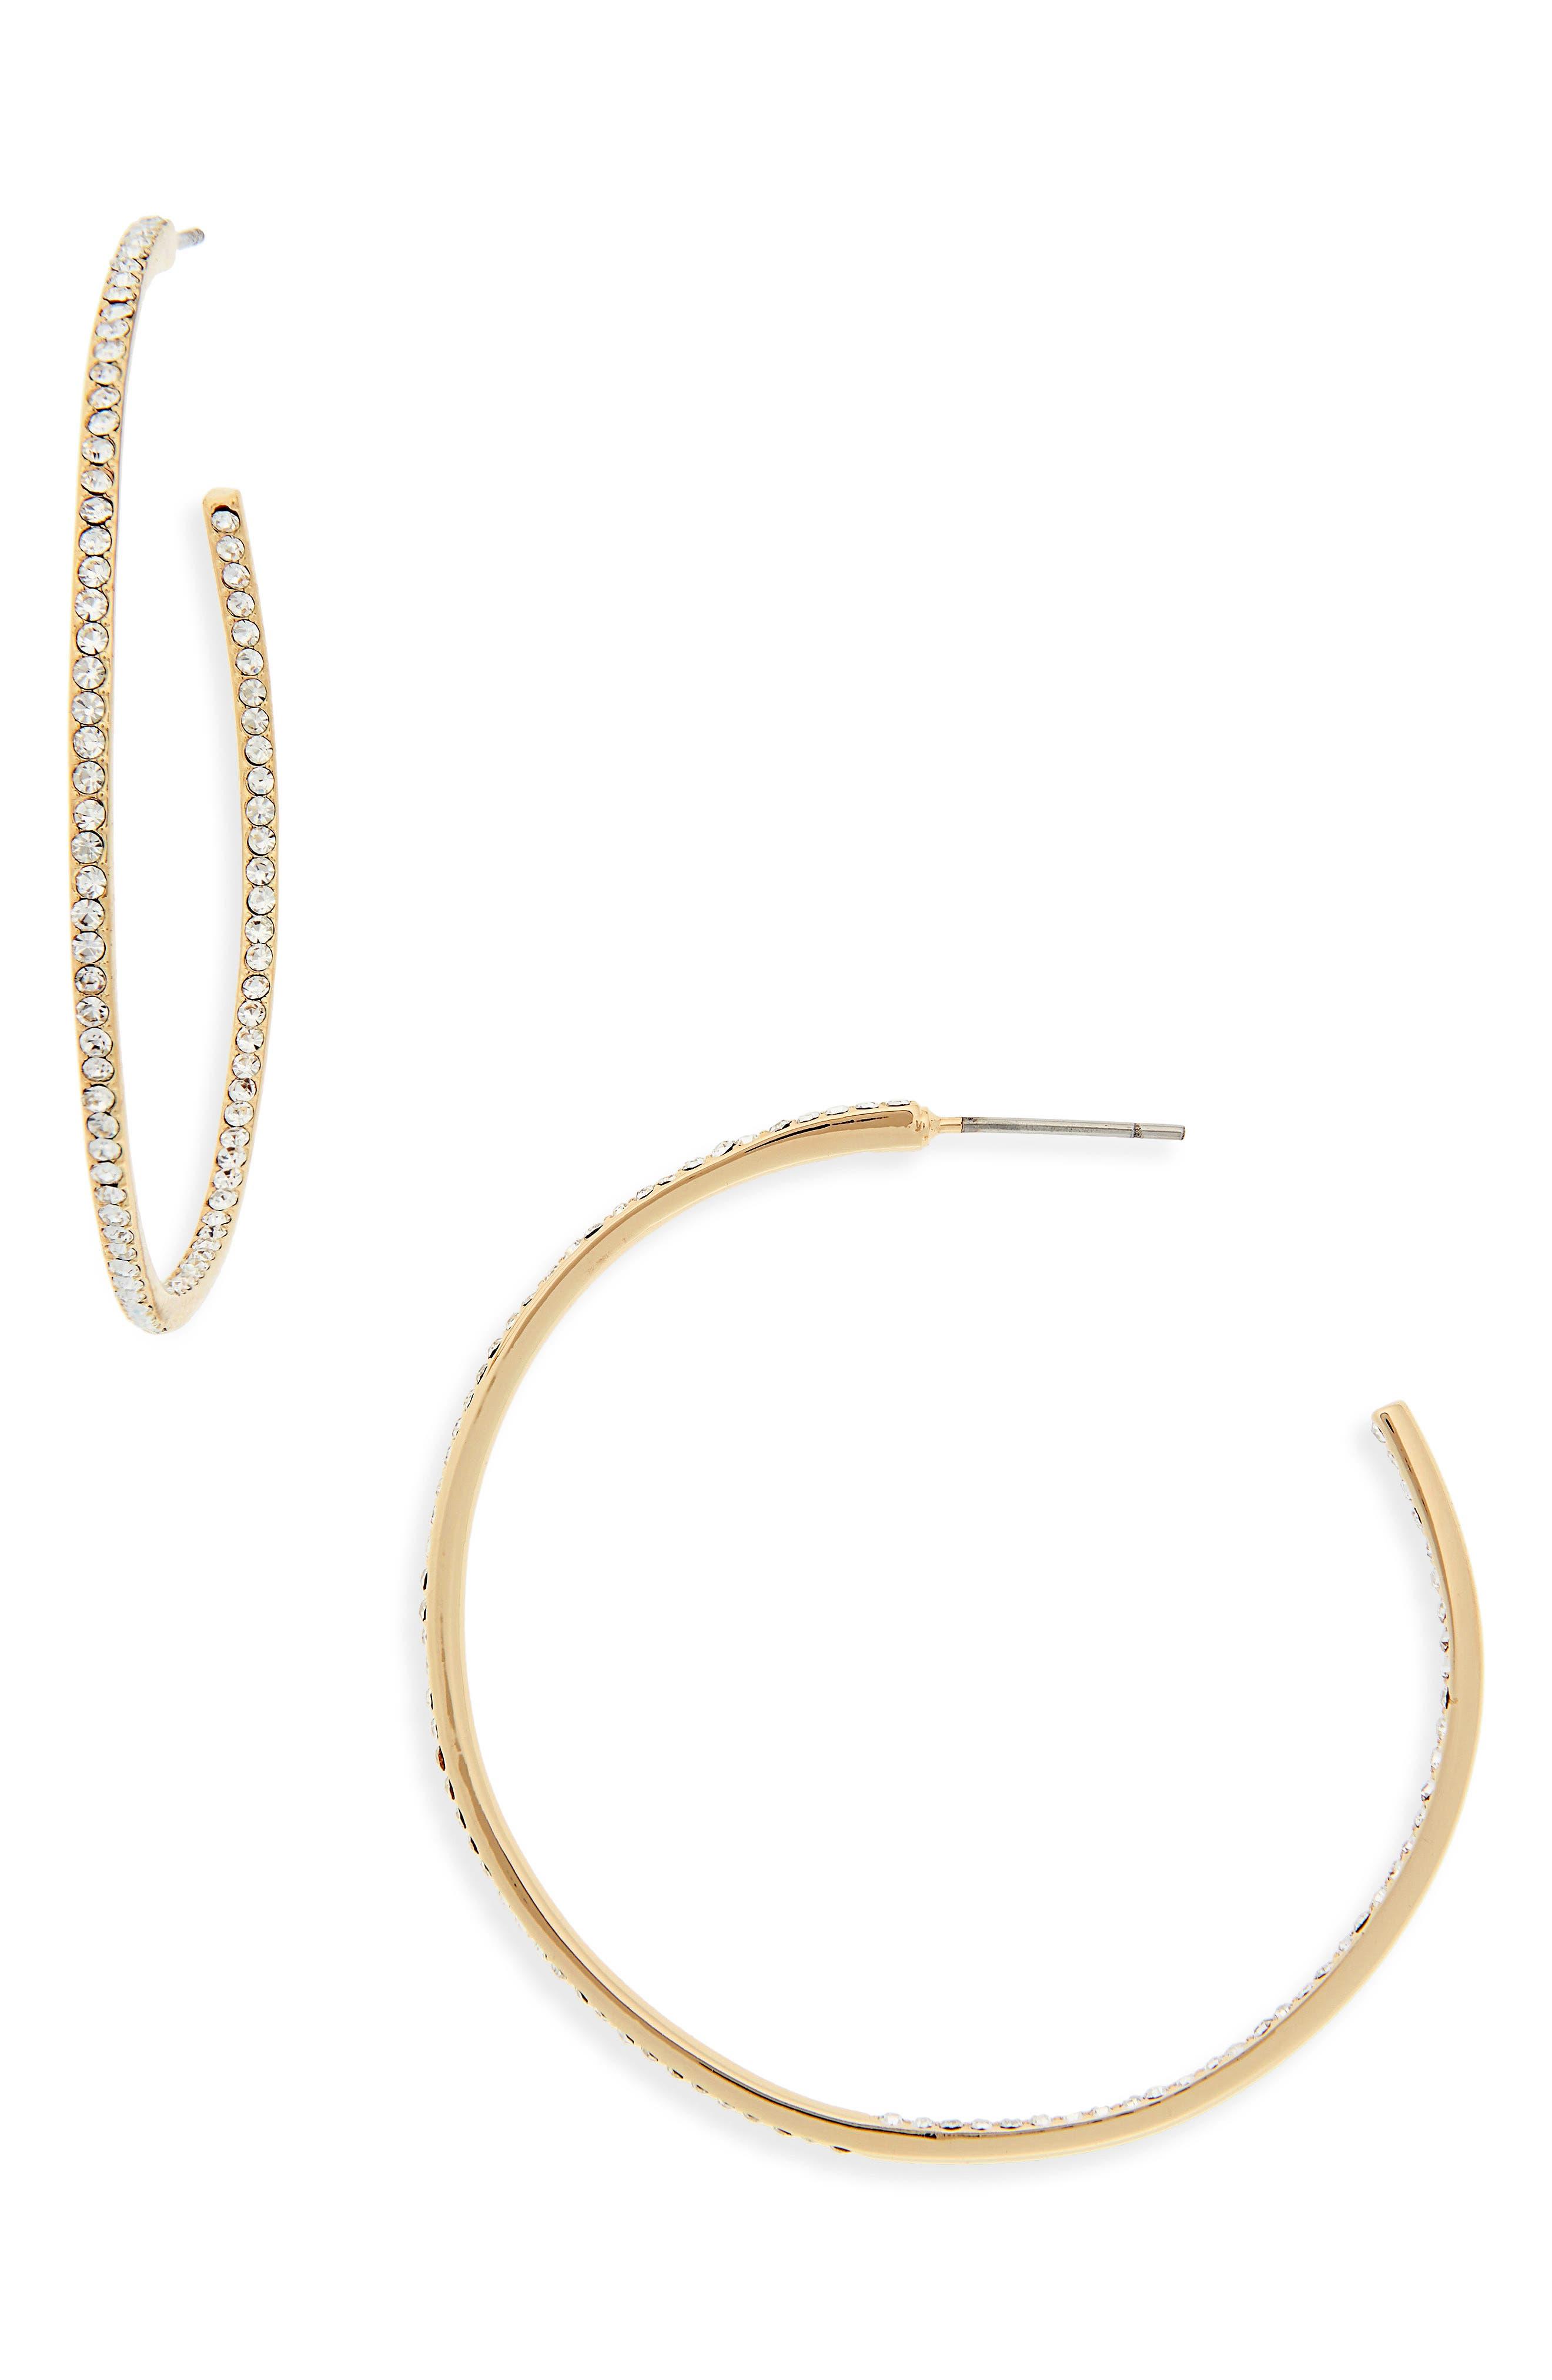 NORDSTROM, Medium Seamless Pavé Hoop Earrings, Main thumbnail 1, color, CLEAR- GOLD